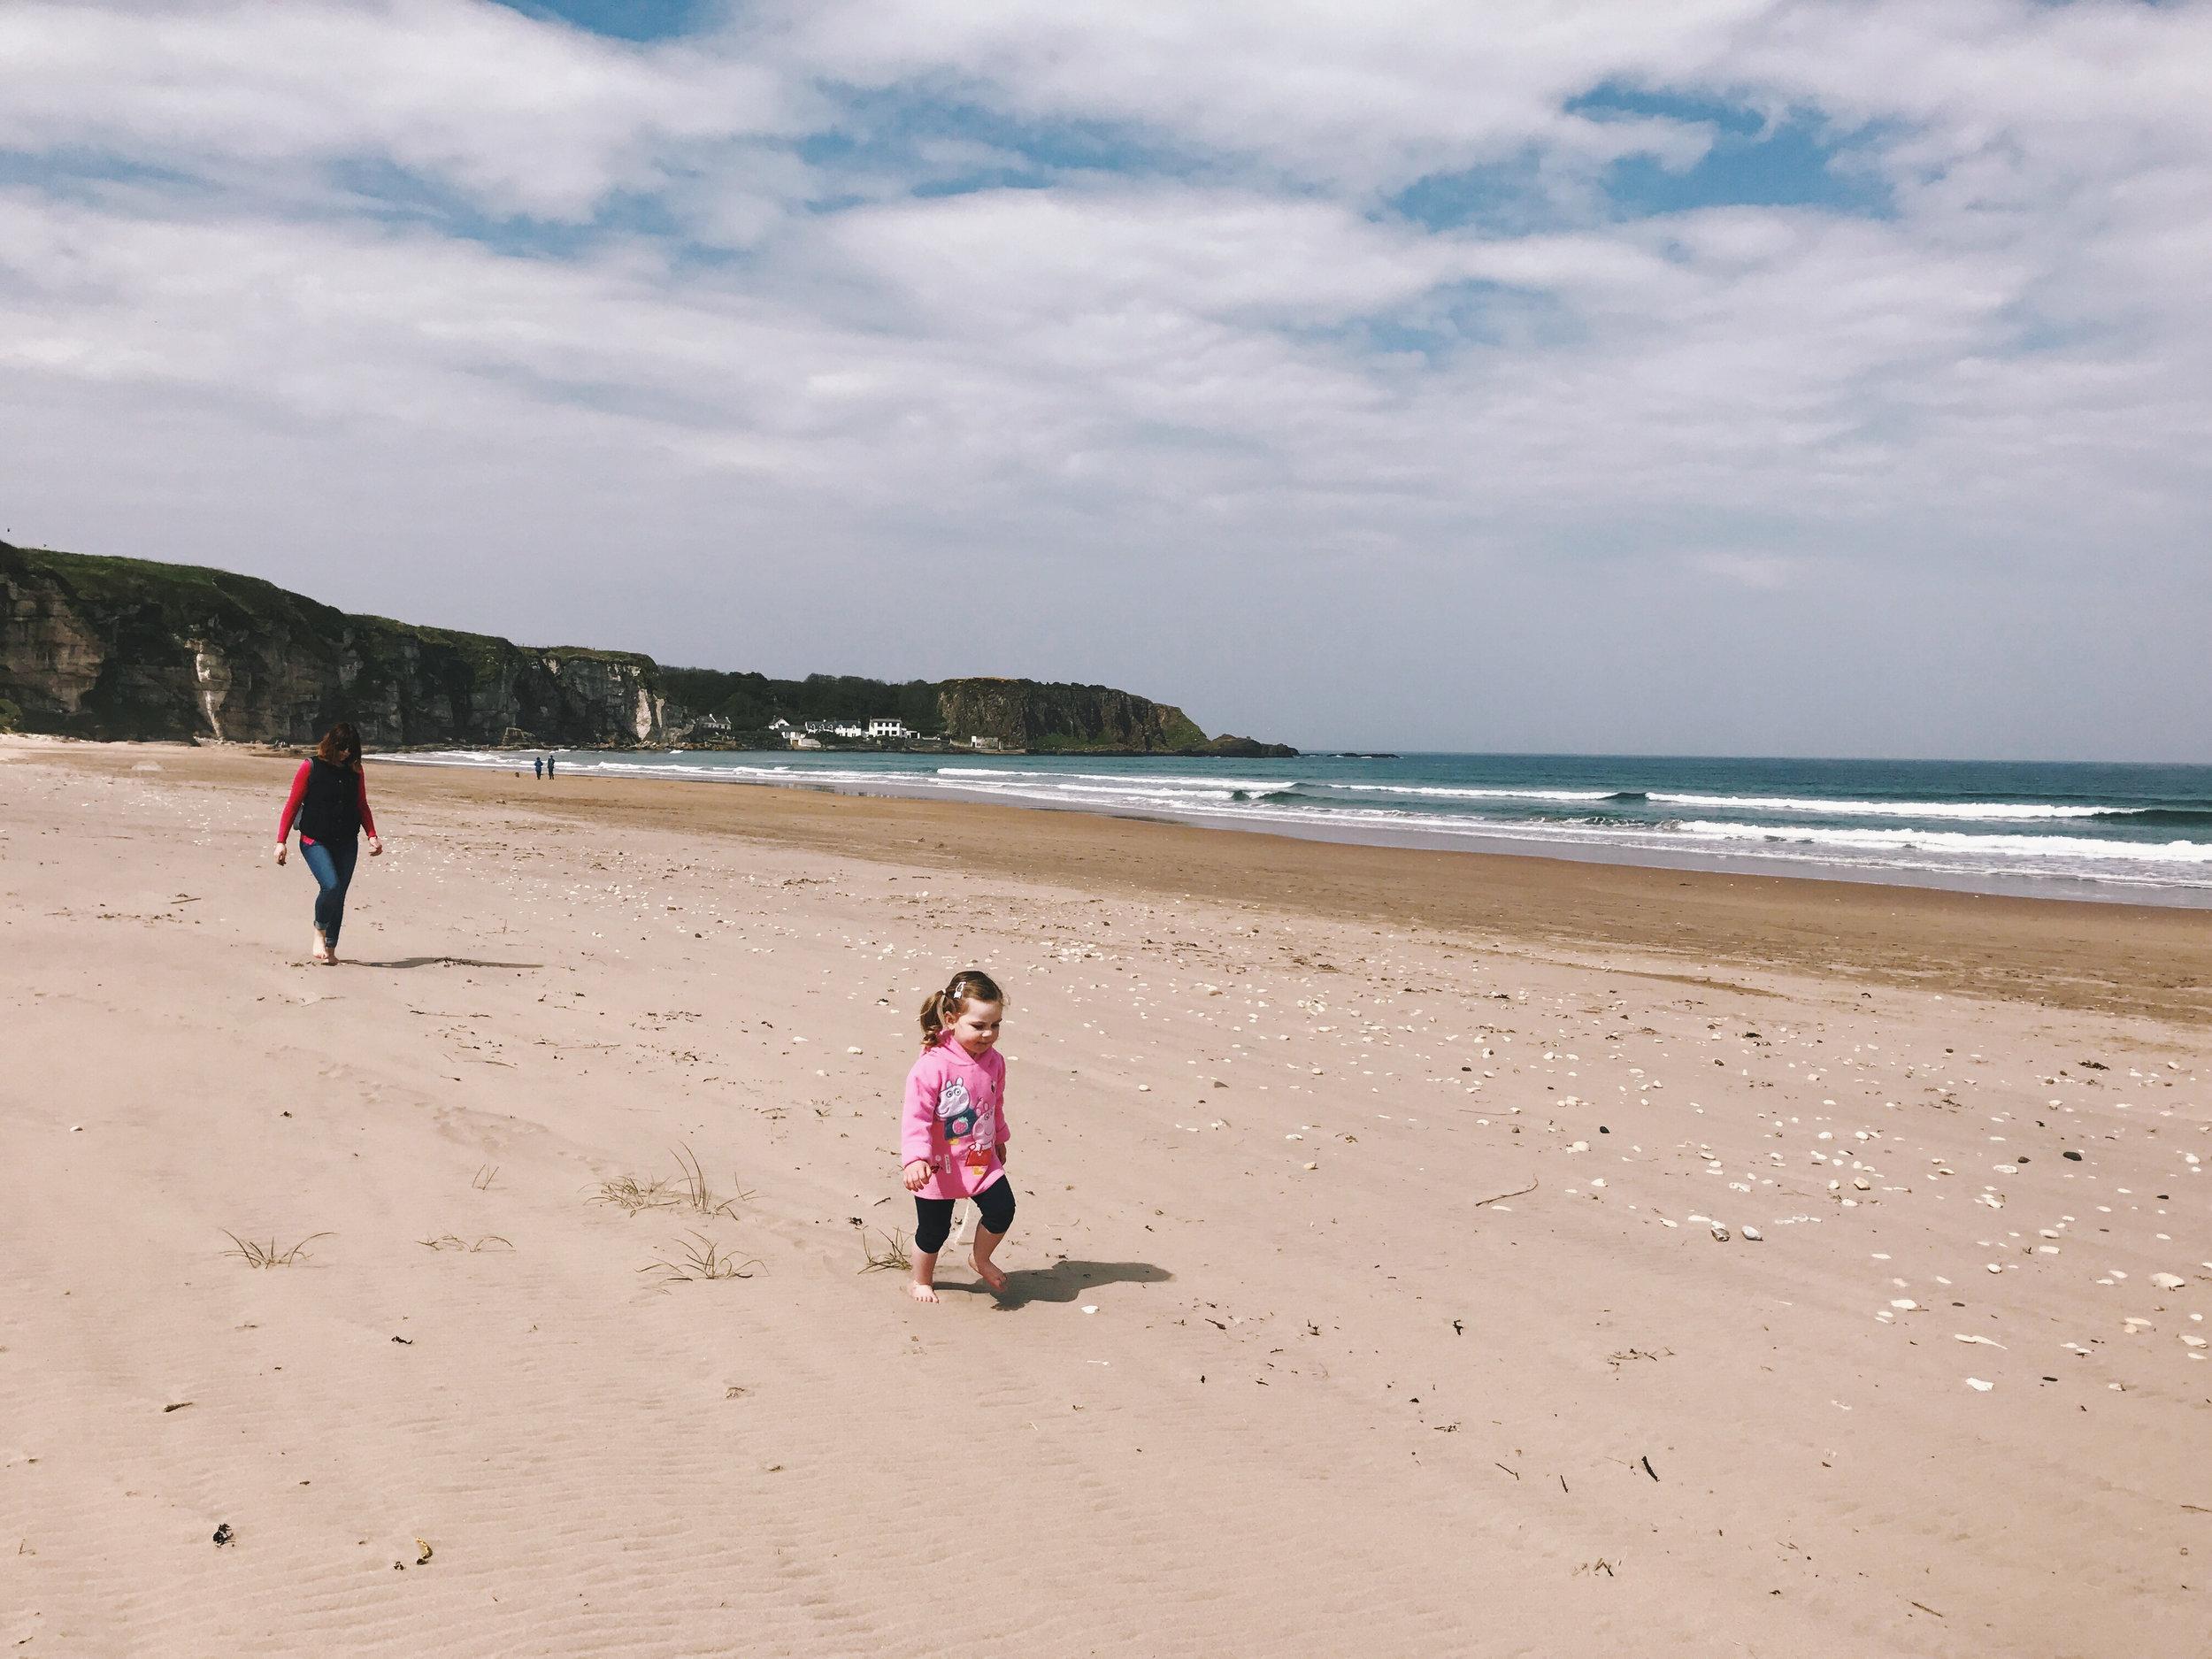 White Park Bay Beach